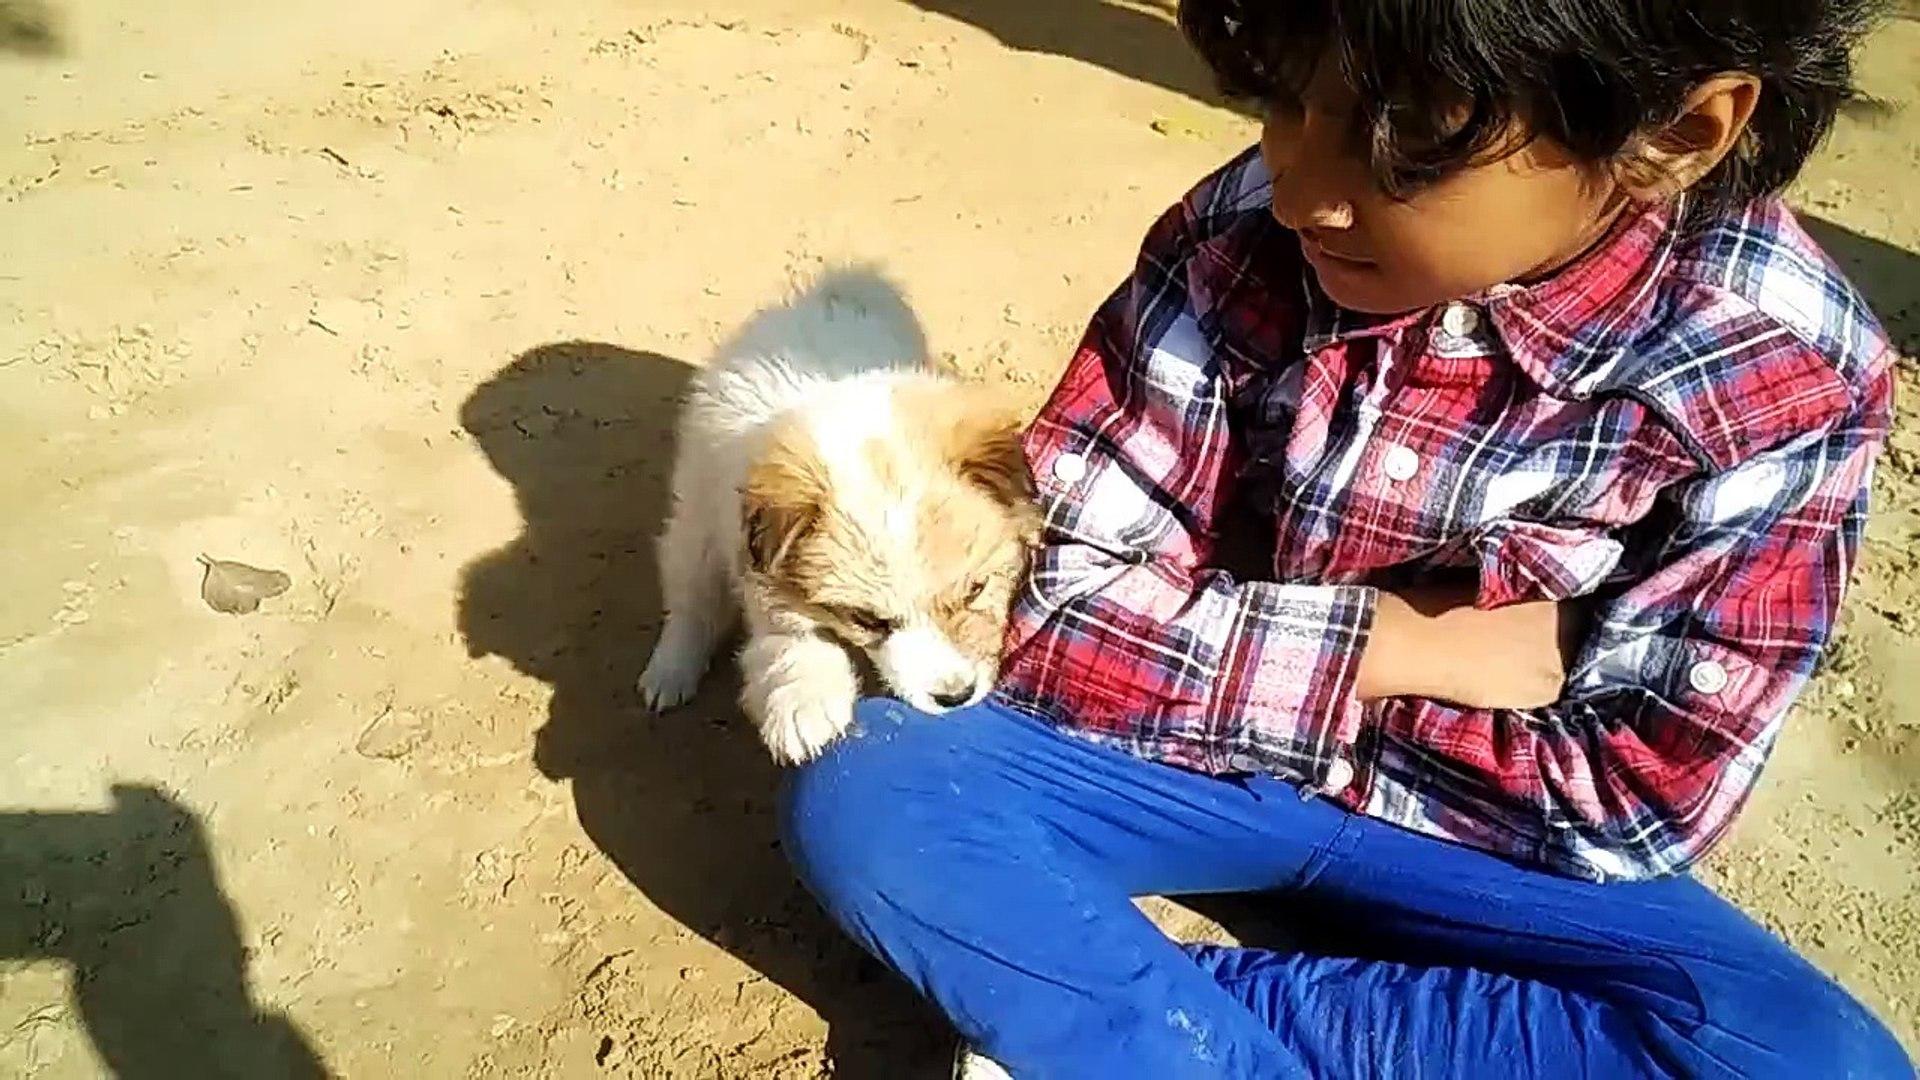 My Cute Puppy is my Best Friend - Cute Baby Video - Cute Puppy Video